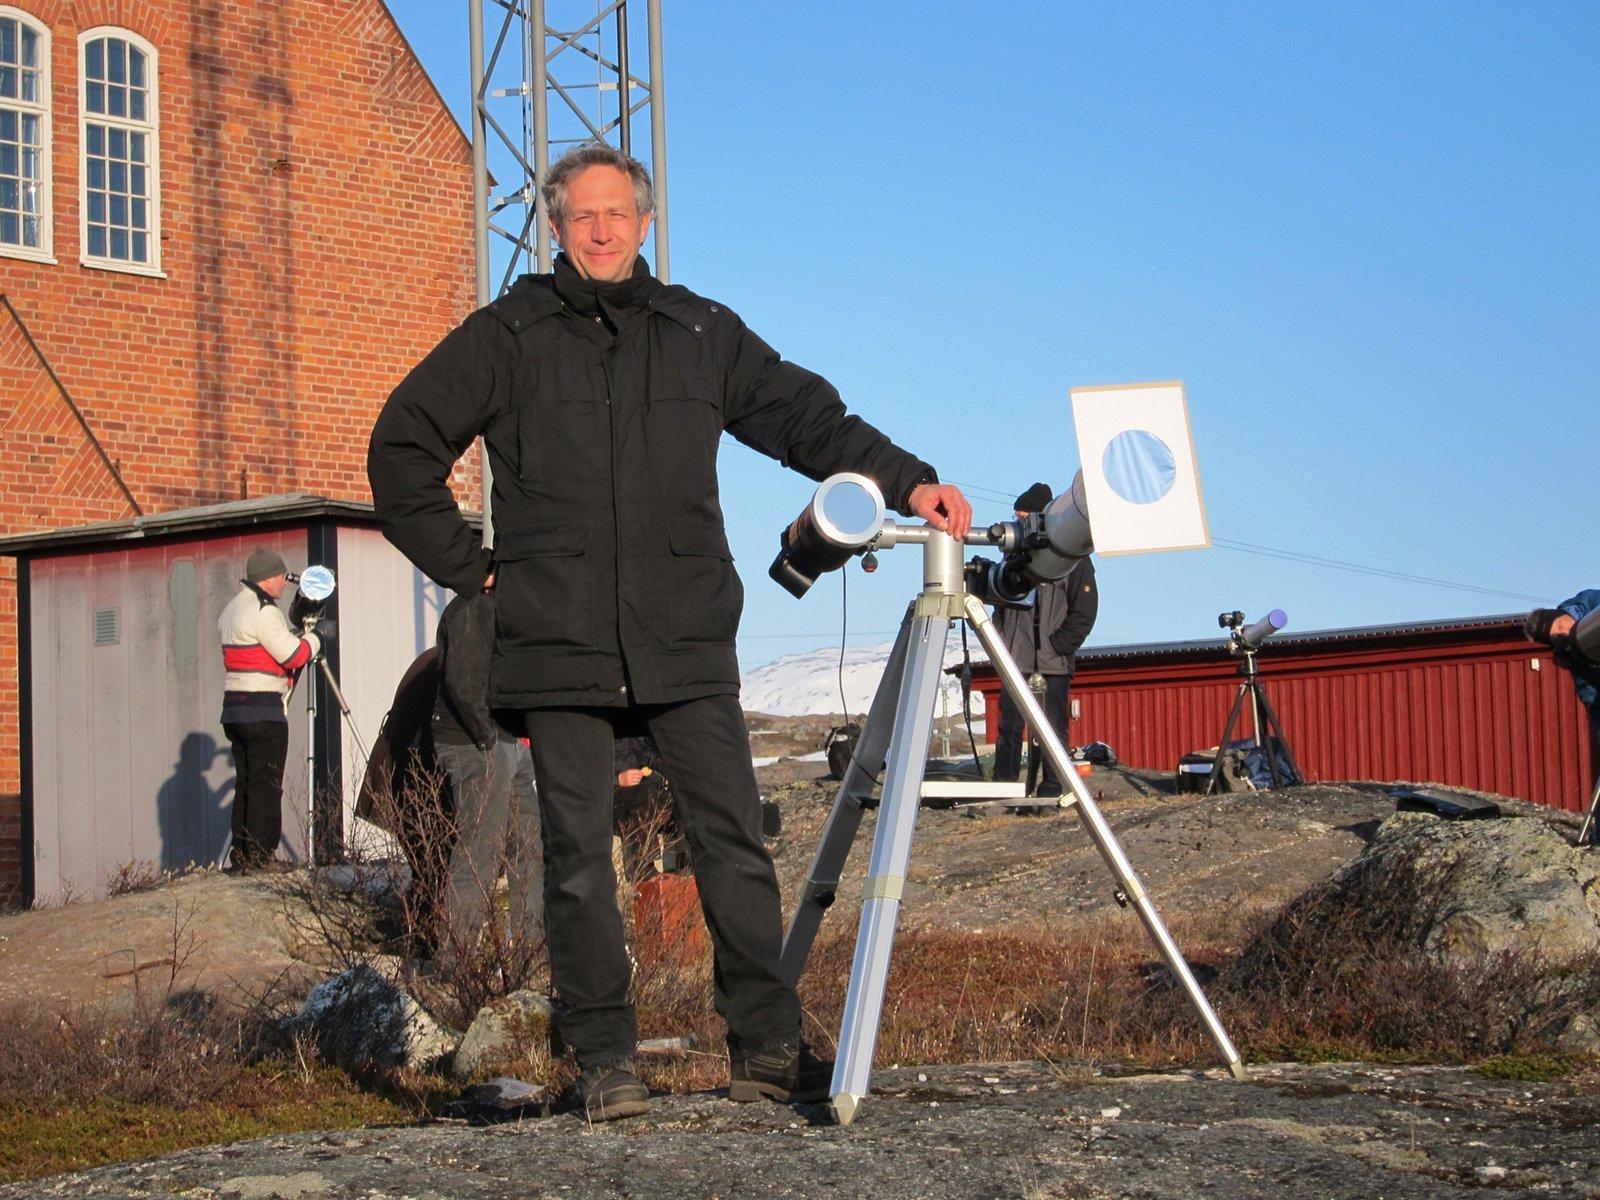 Sven Melchert neben seinem Teleskop bei der Beobachtung des Venustransits am Morgen des 12. Juni 2012.